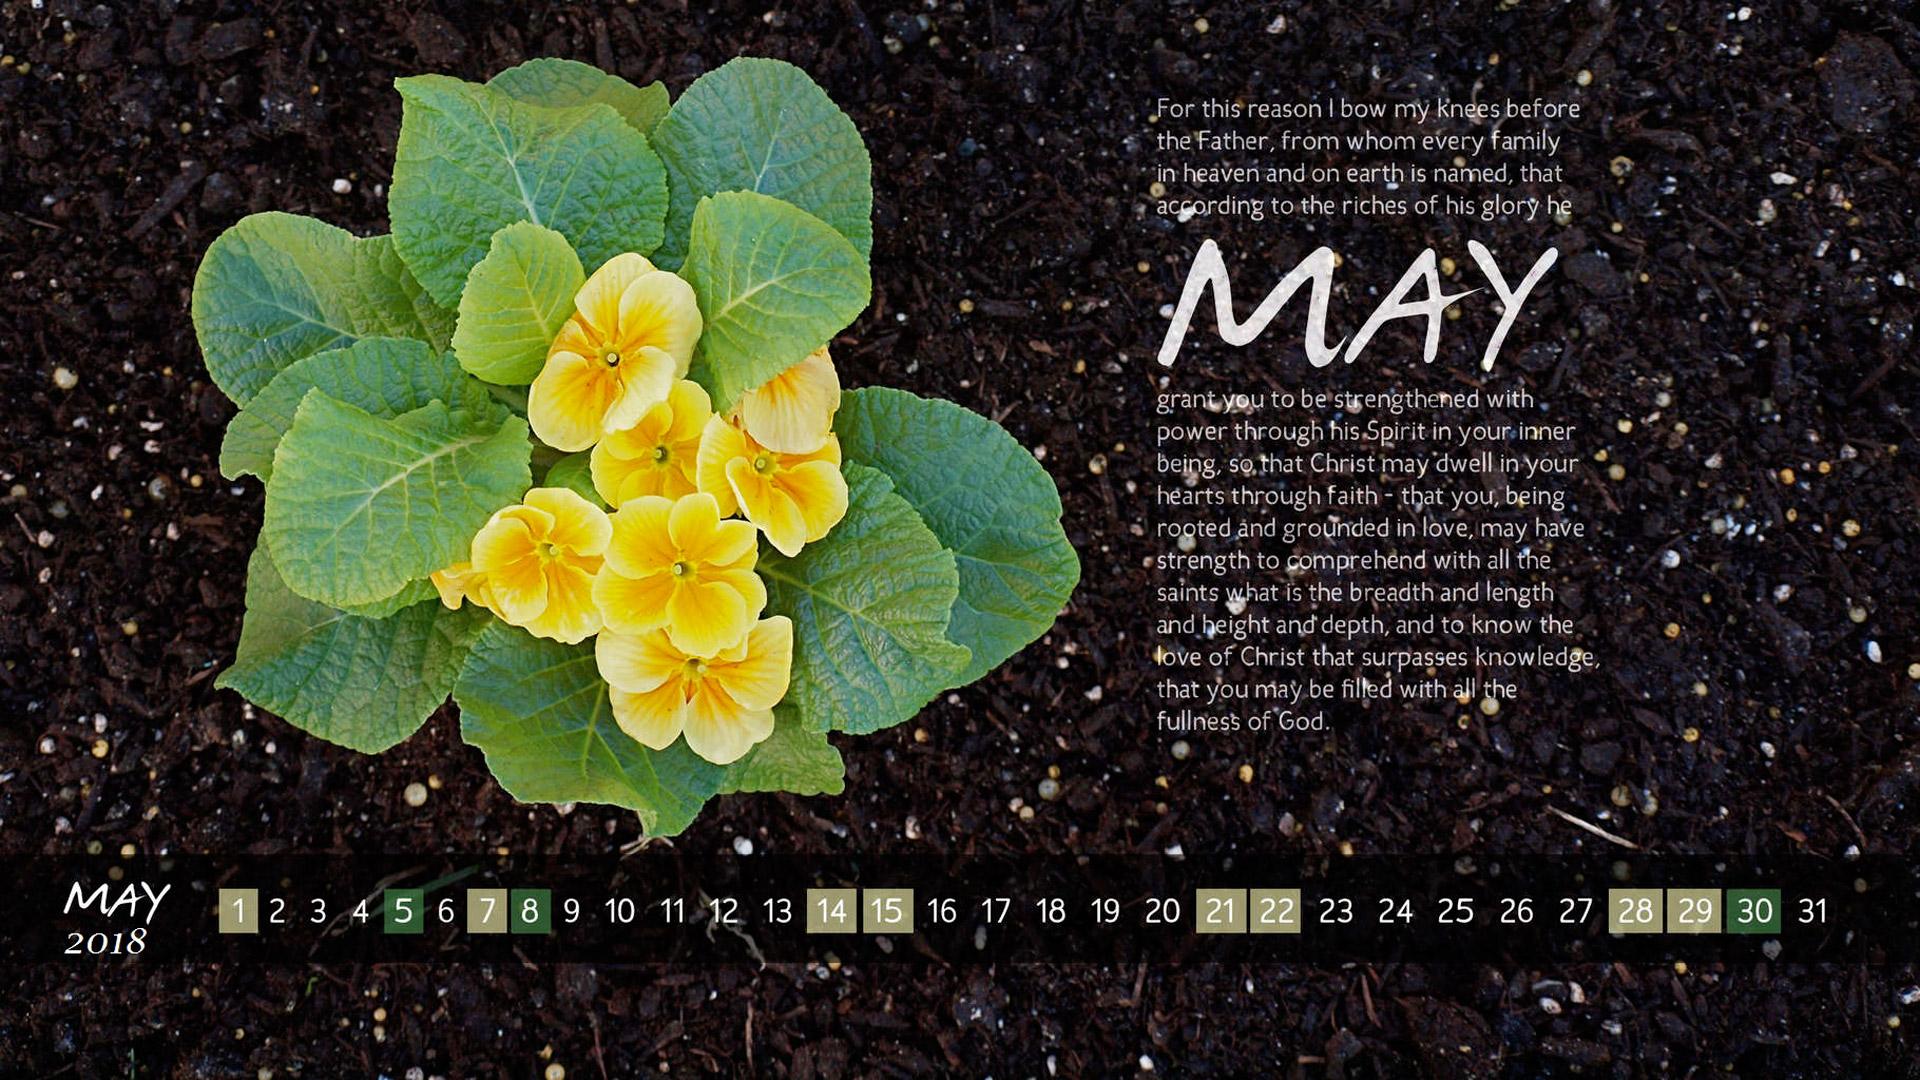 hinh-nen-chao-thang-5-hello-may-20